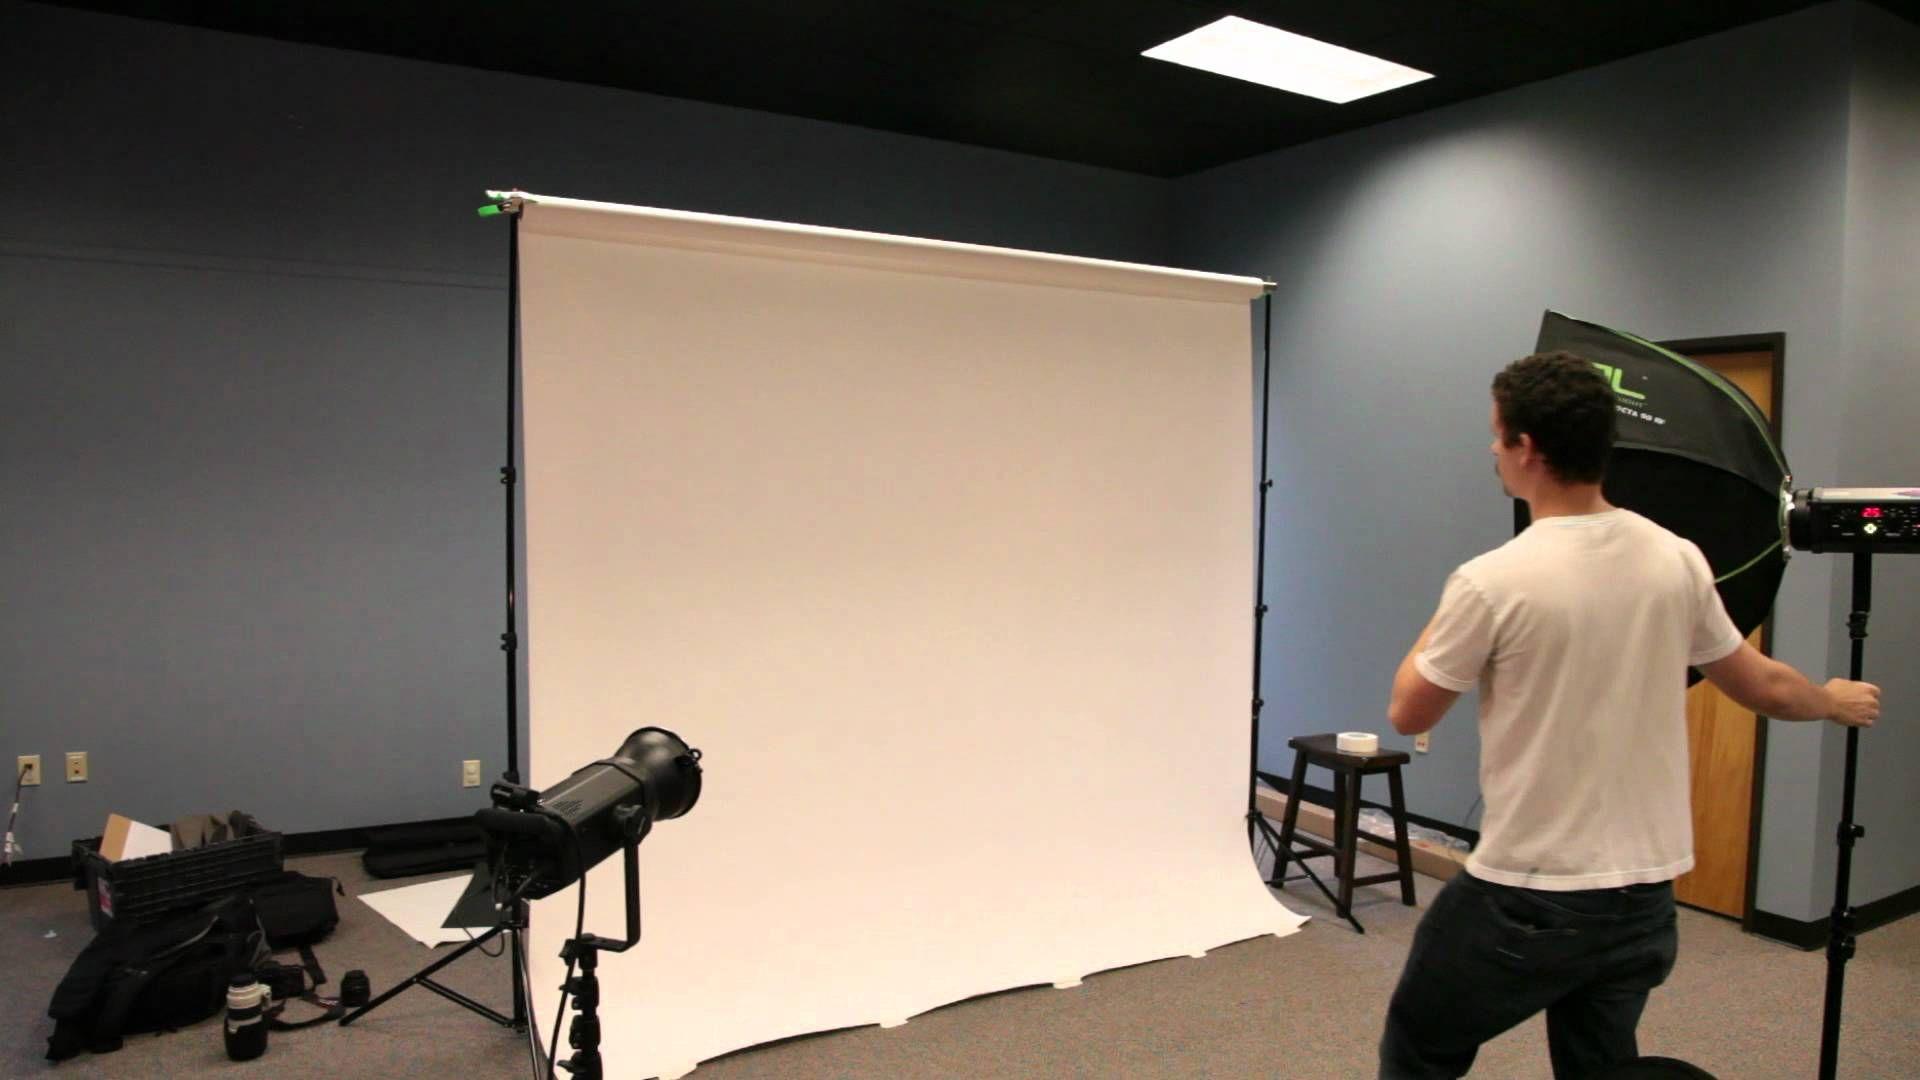 home lighting techniques. Studio Lighting Techniques: Using Only 2 Lights Home Techniques N